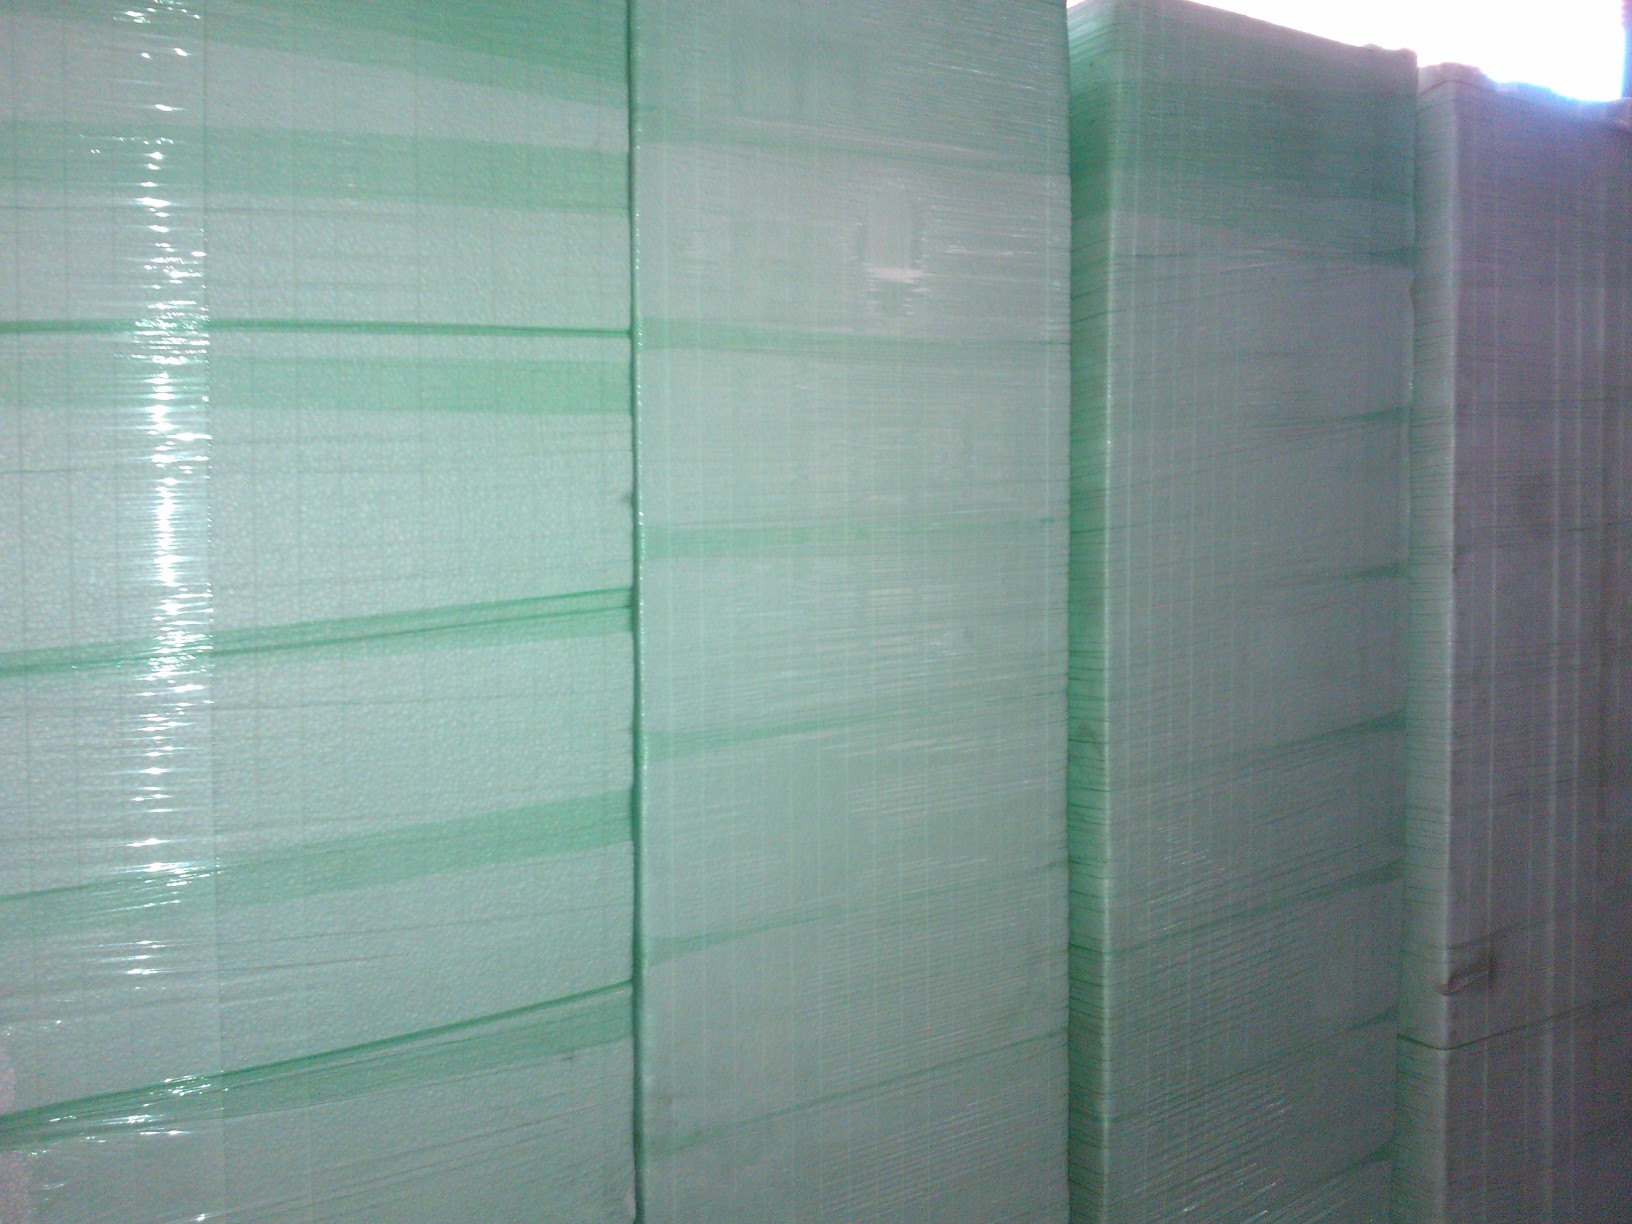 Aislamientos y camaras frigorificas en murcia - Planchas de poliestireno extruido ...